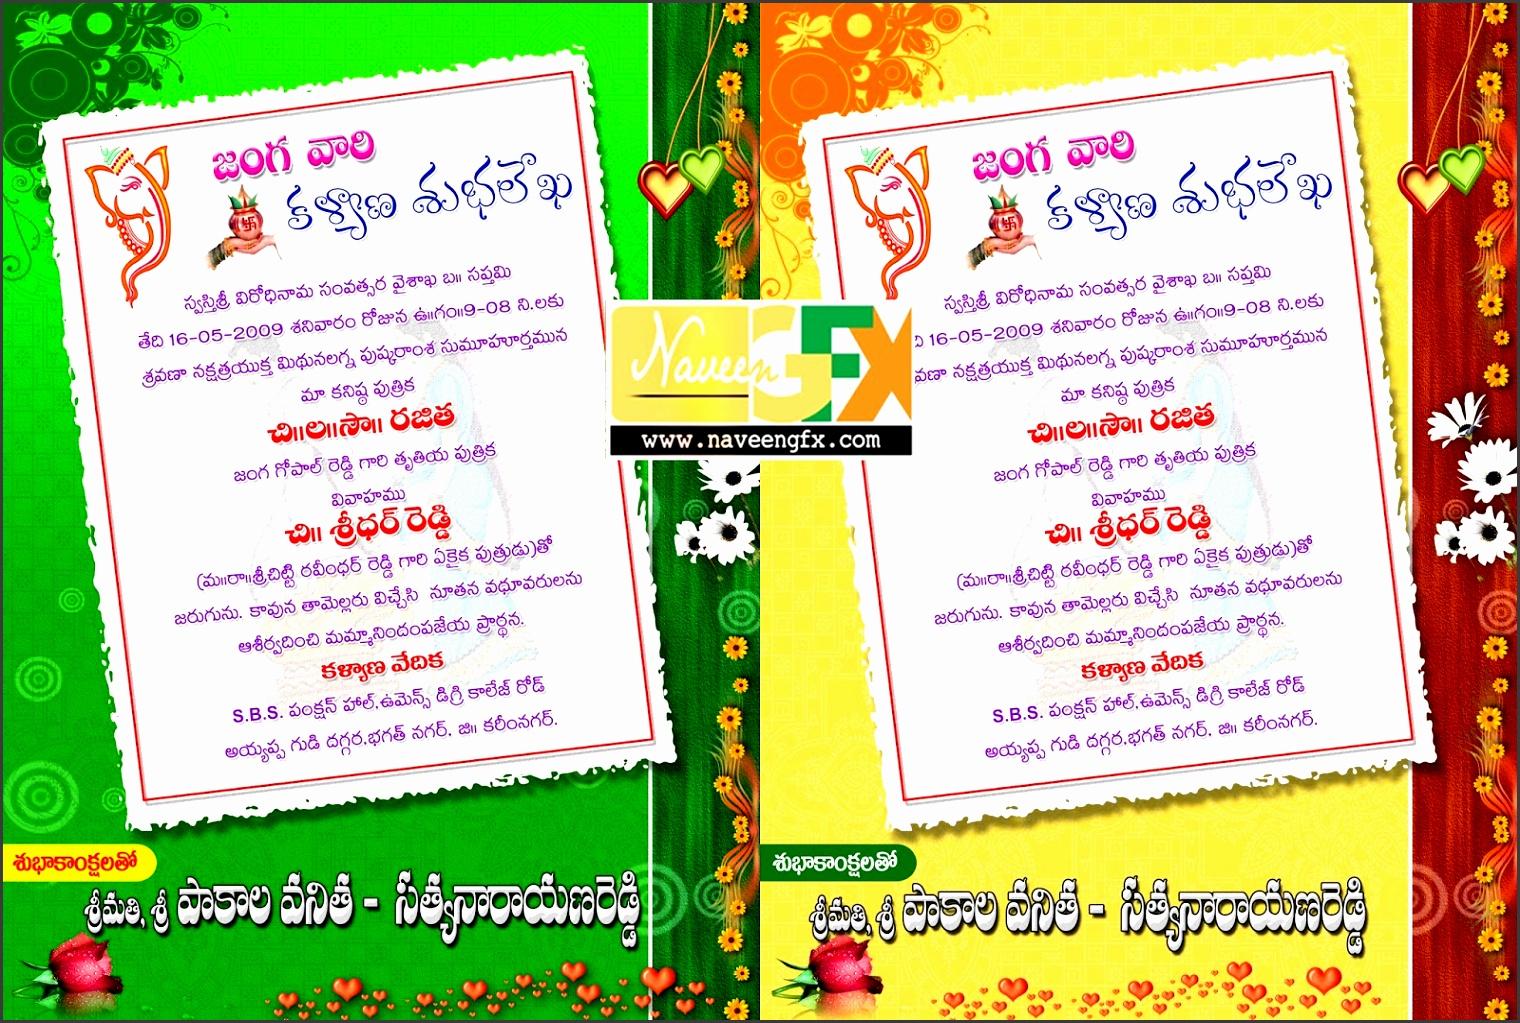 Wedding Invitation Card Download: 5 Wedding Invitation Card Template Psd Free Download